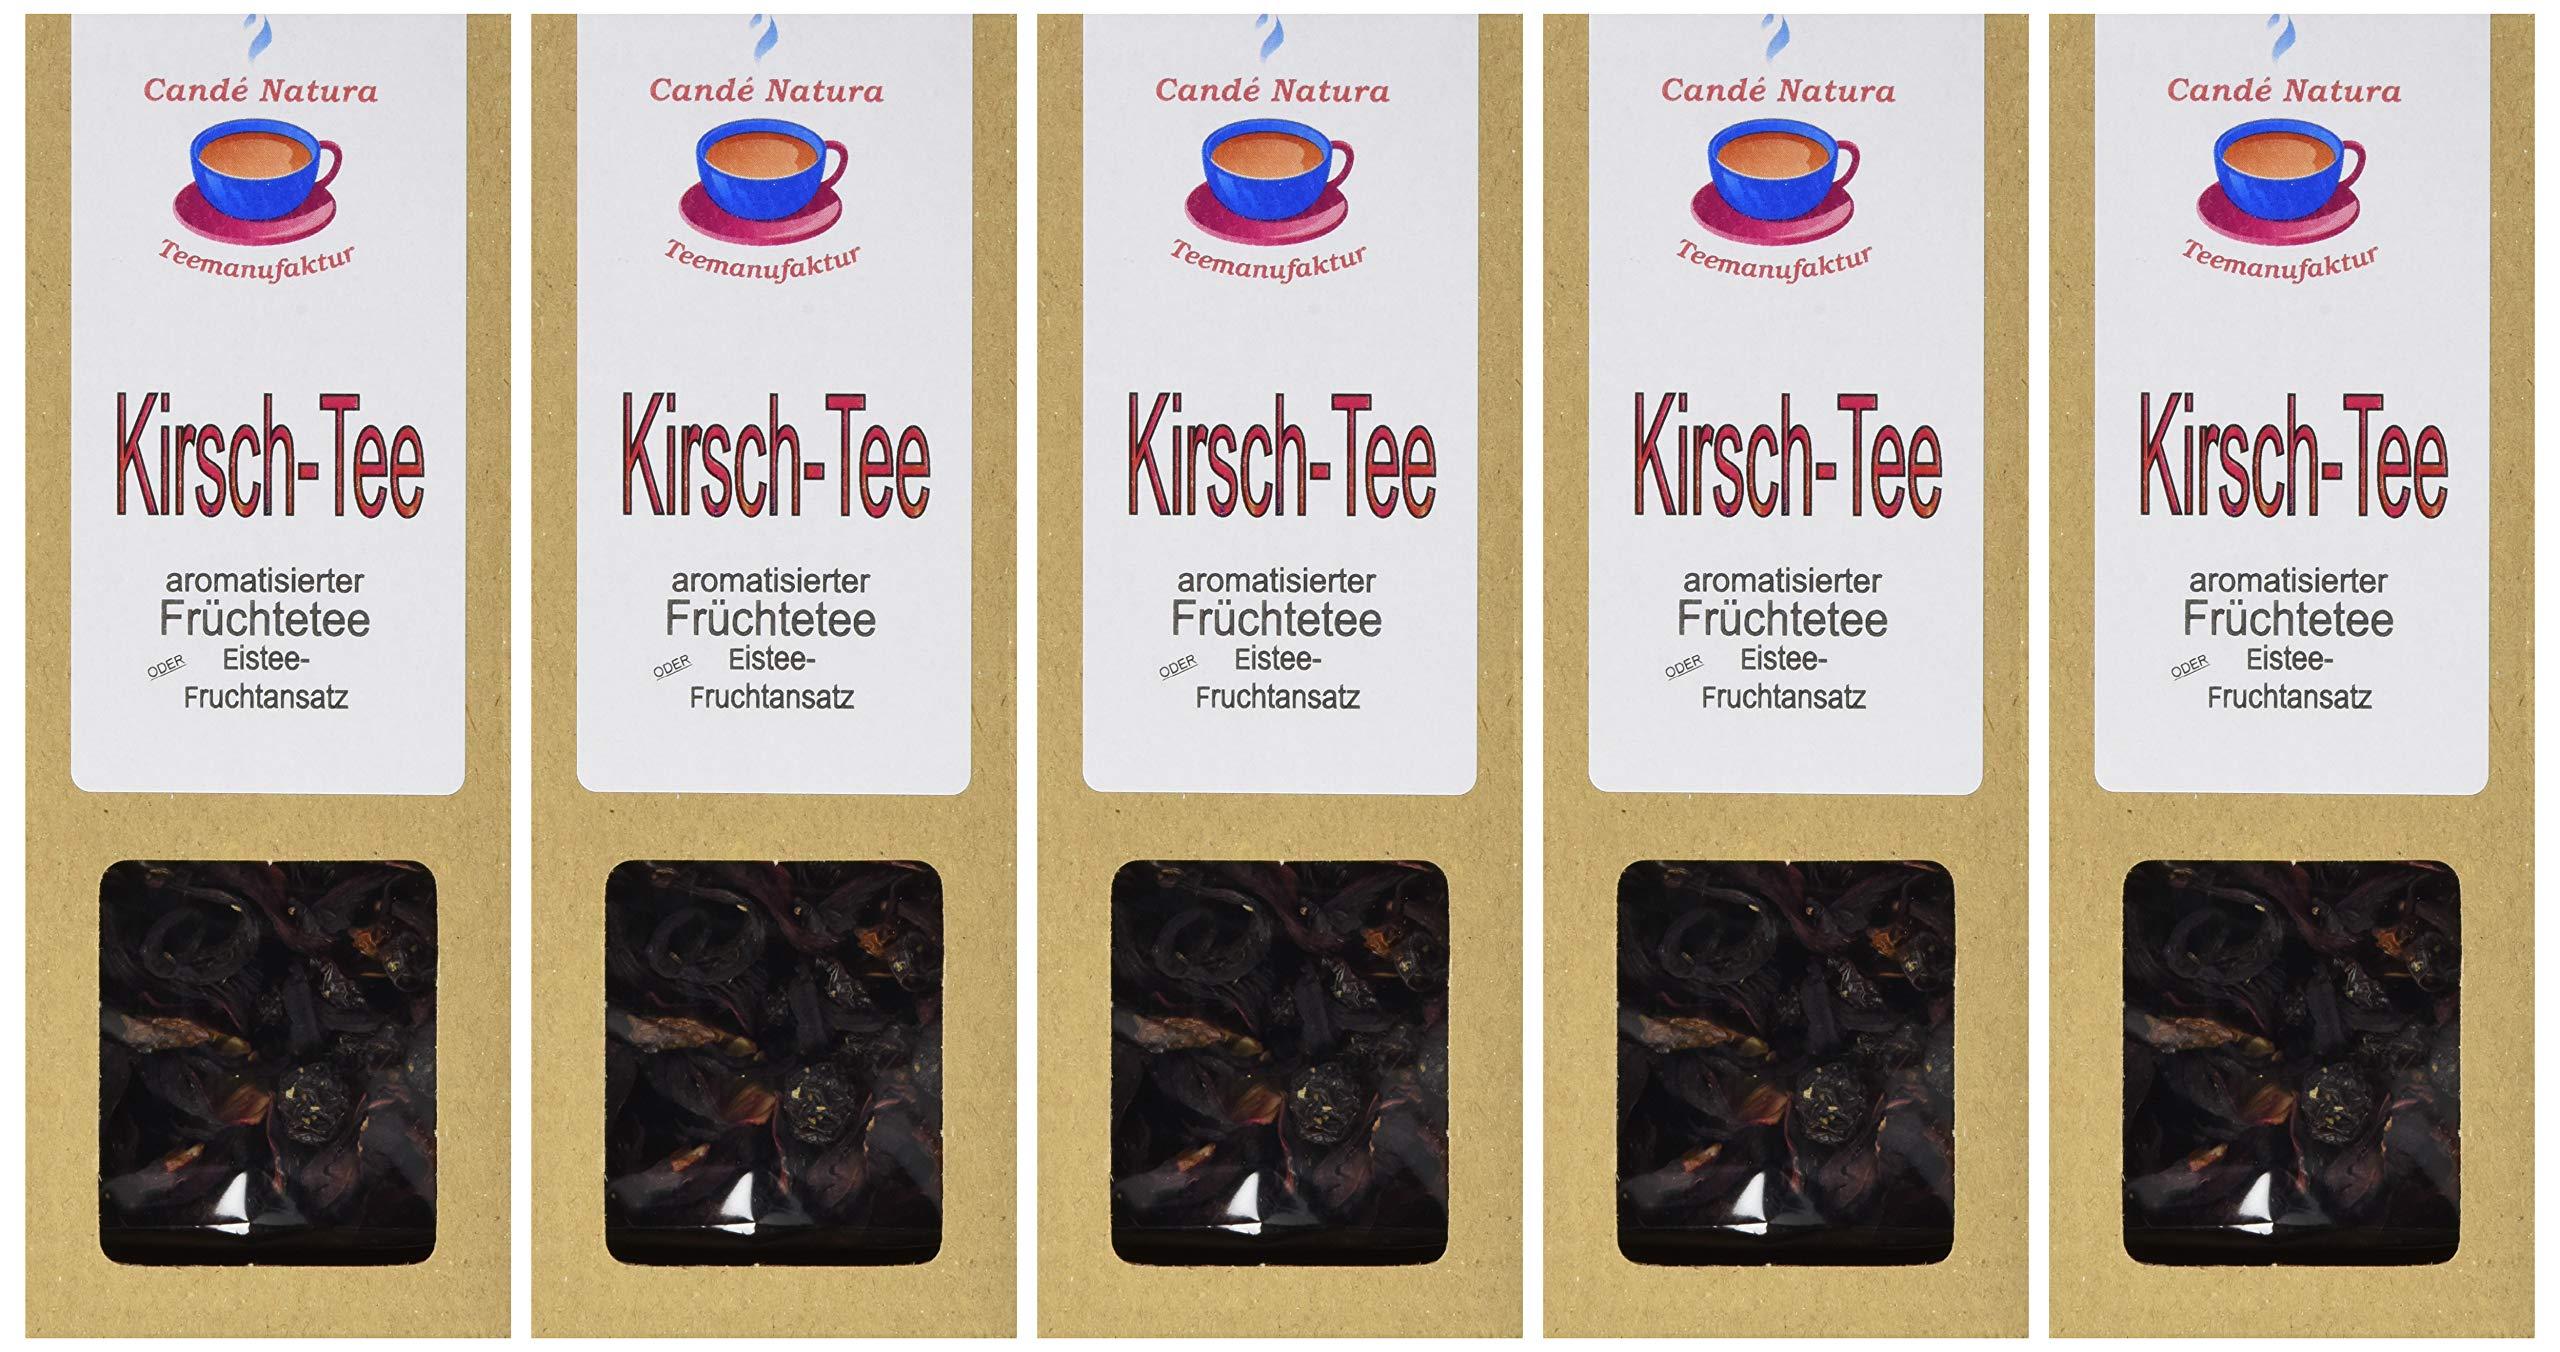 Cand-Natura-Teemanufaktur-Kirschtee-Frchteteemischung-aromatisiert-5er-Pack-5-x-90-g